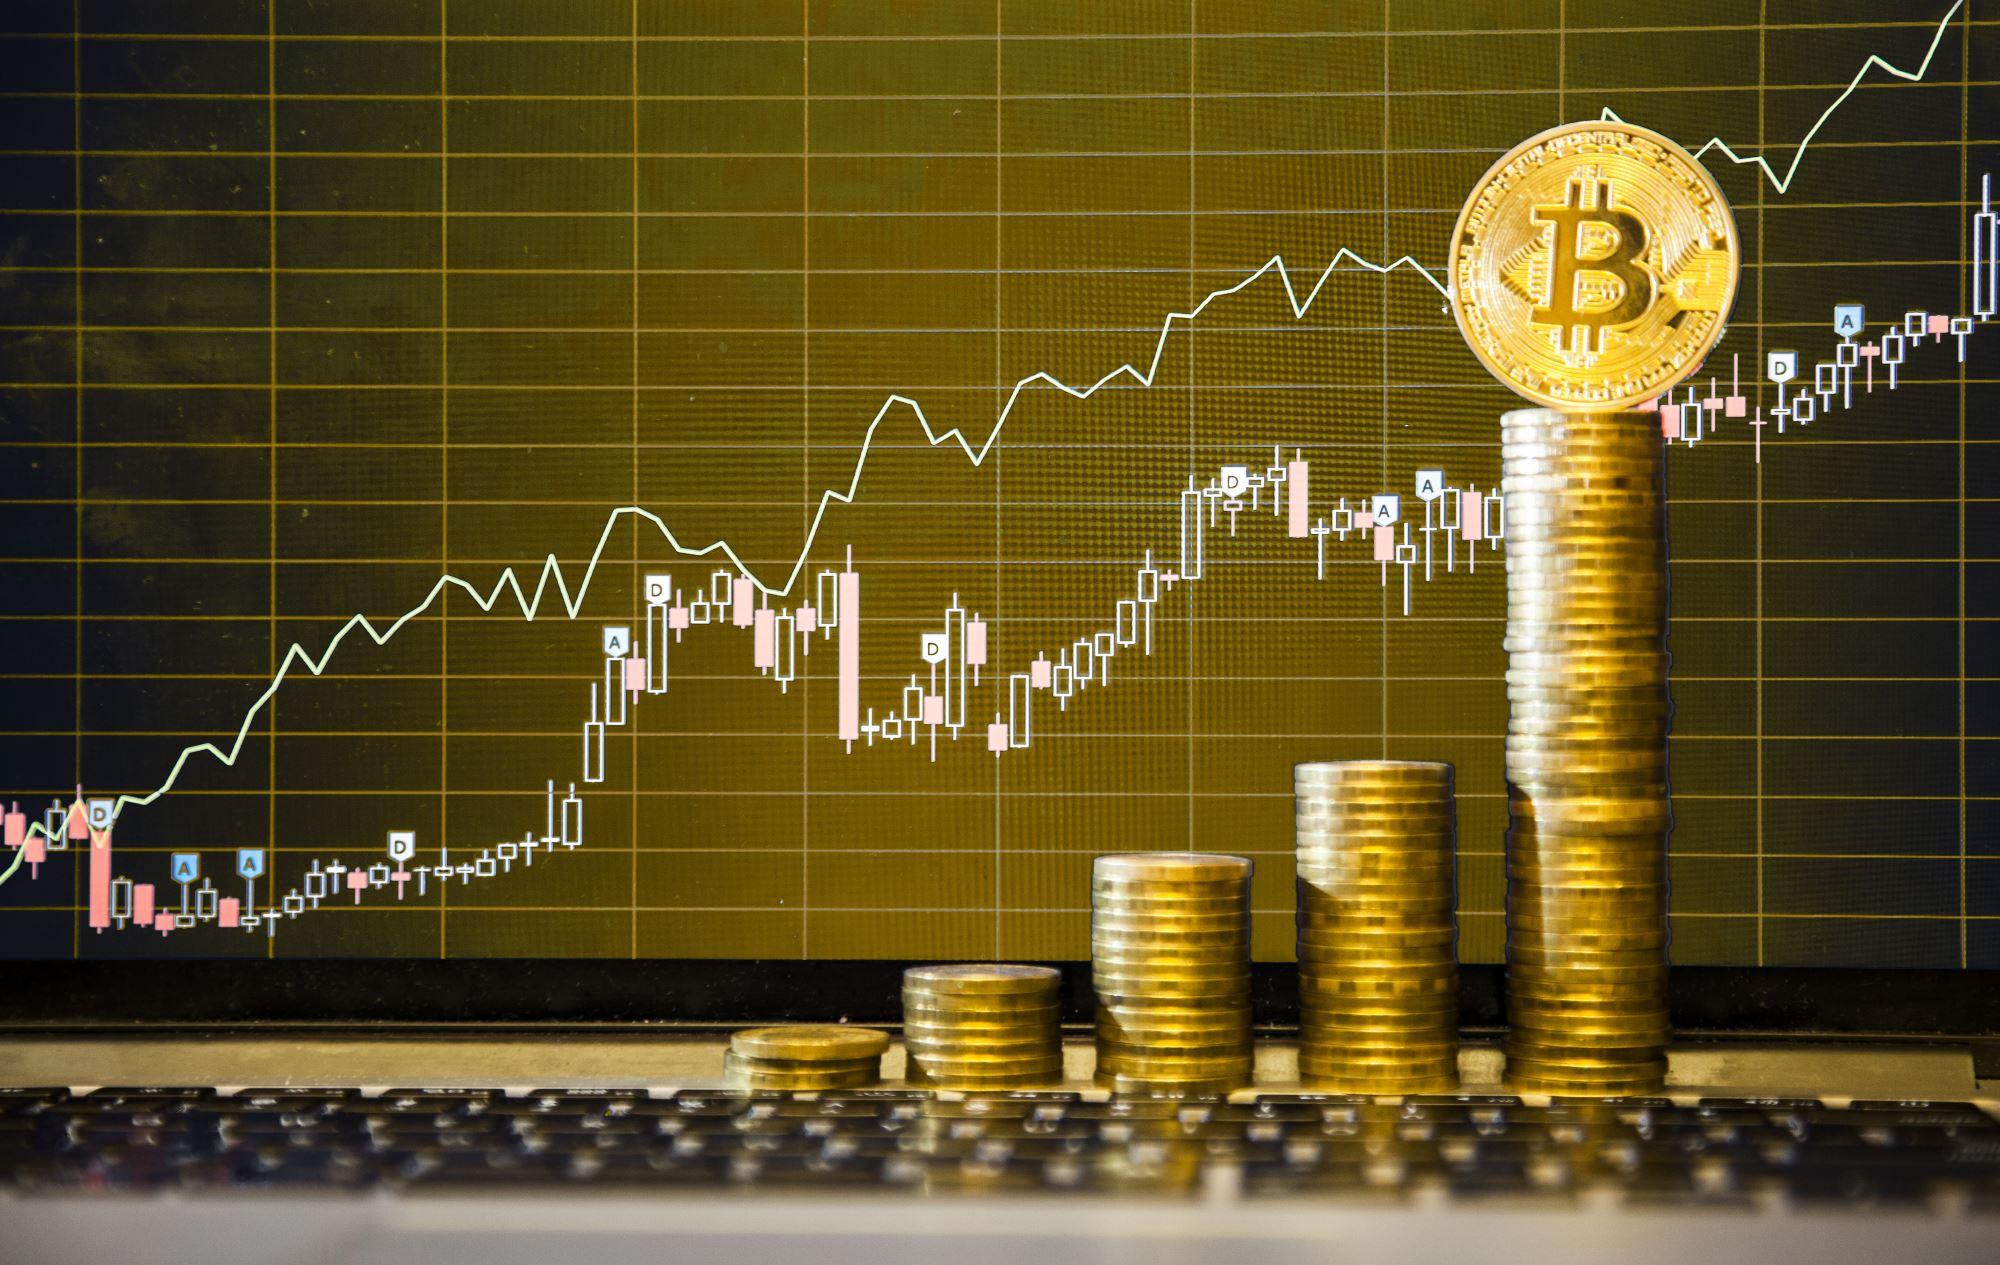 Bitcoin Trading With Bitcoin Profit